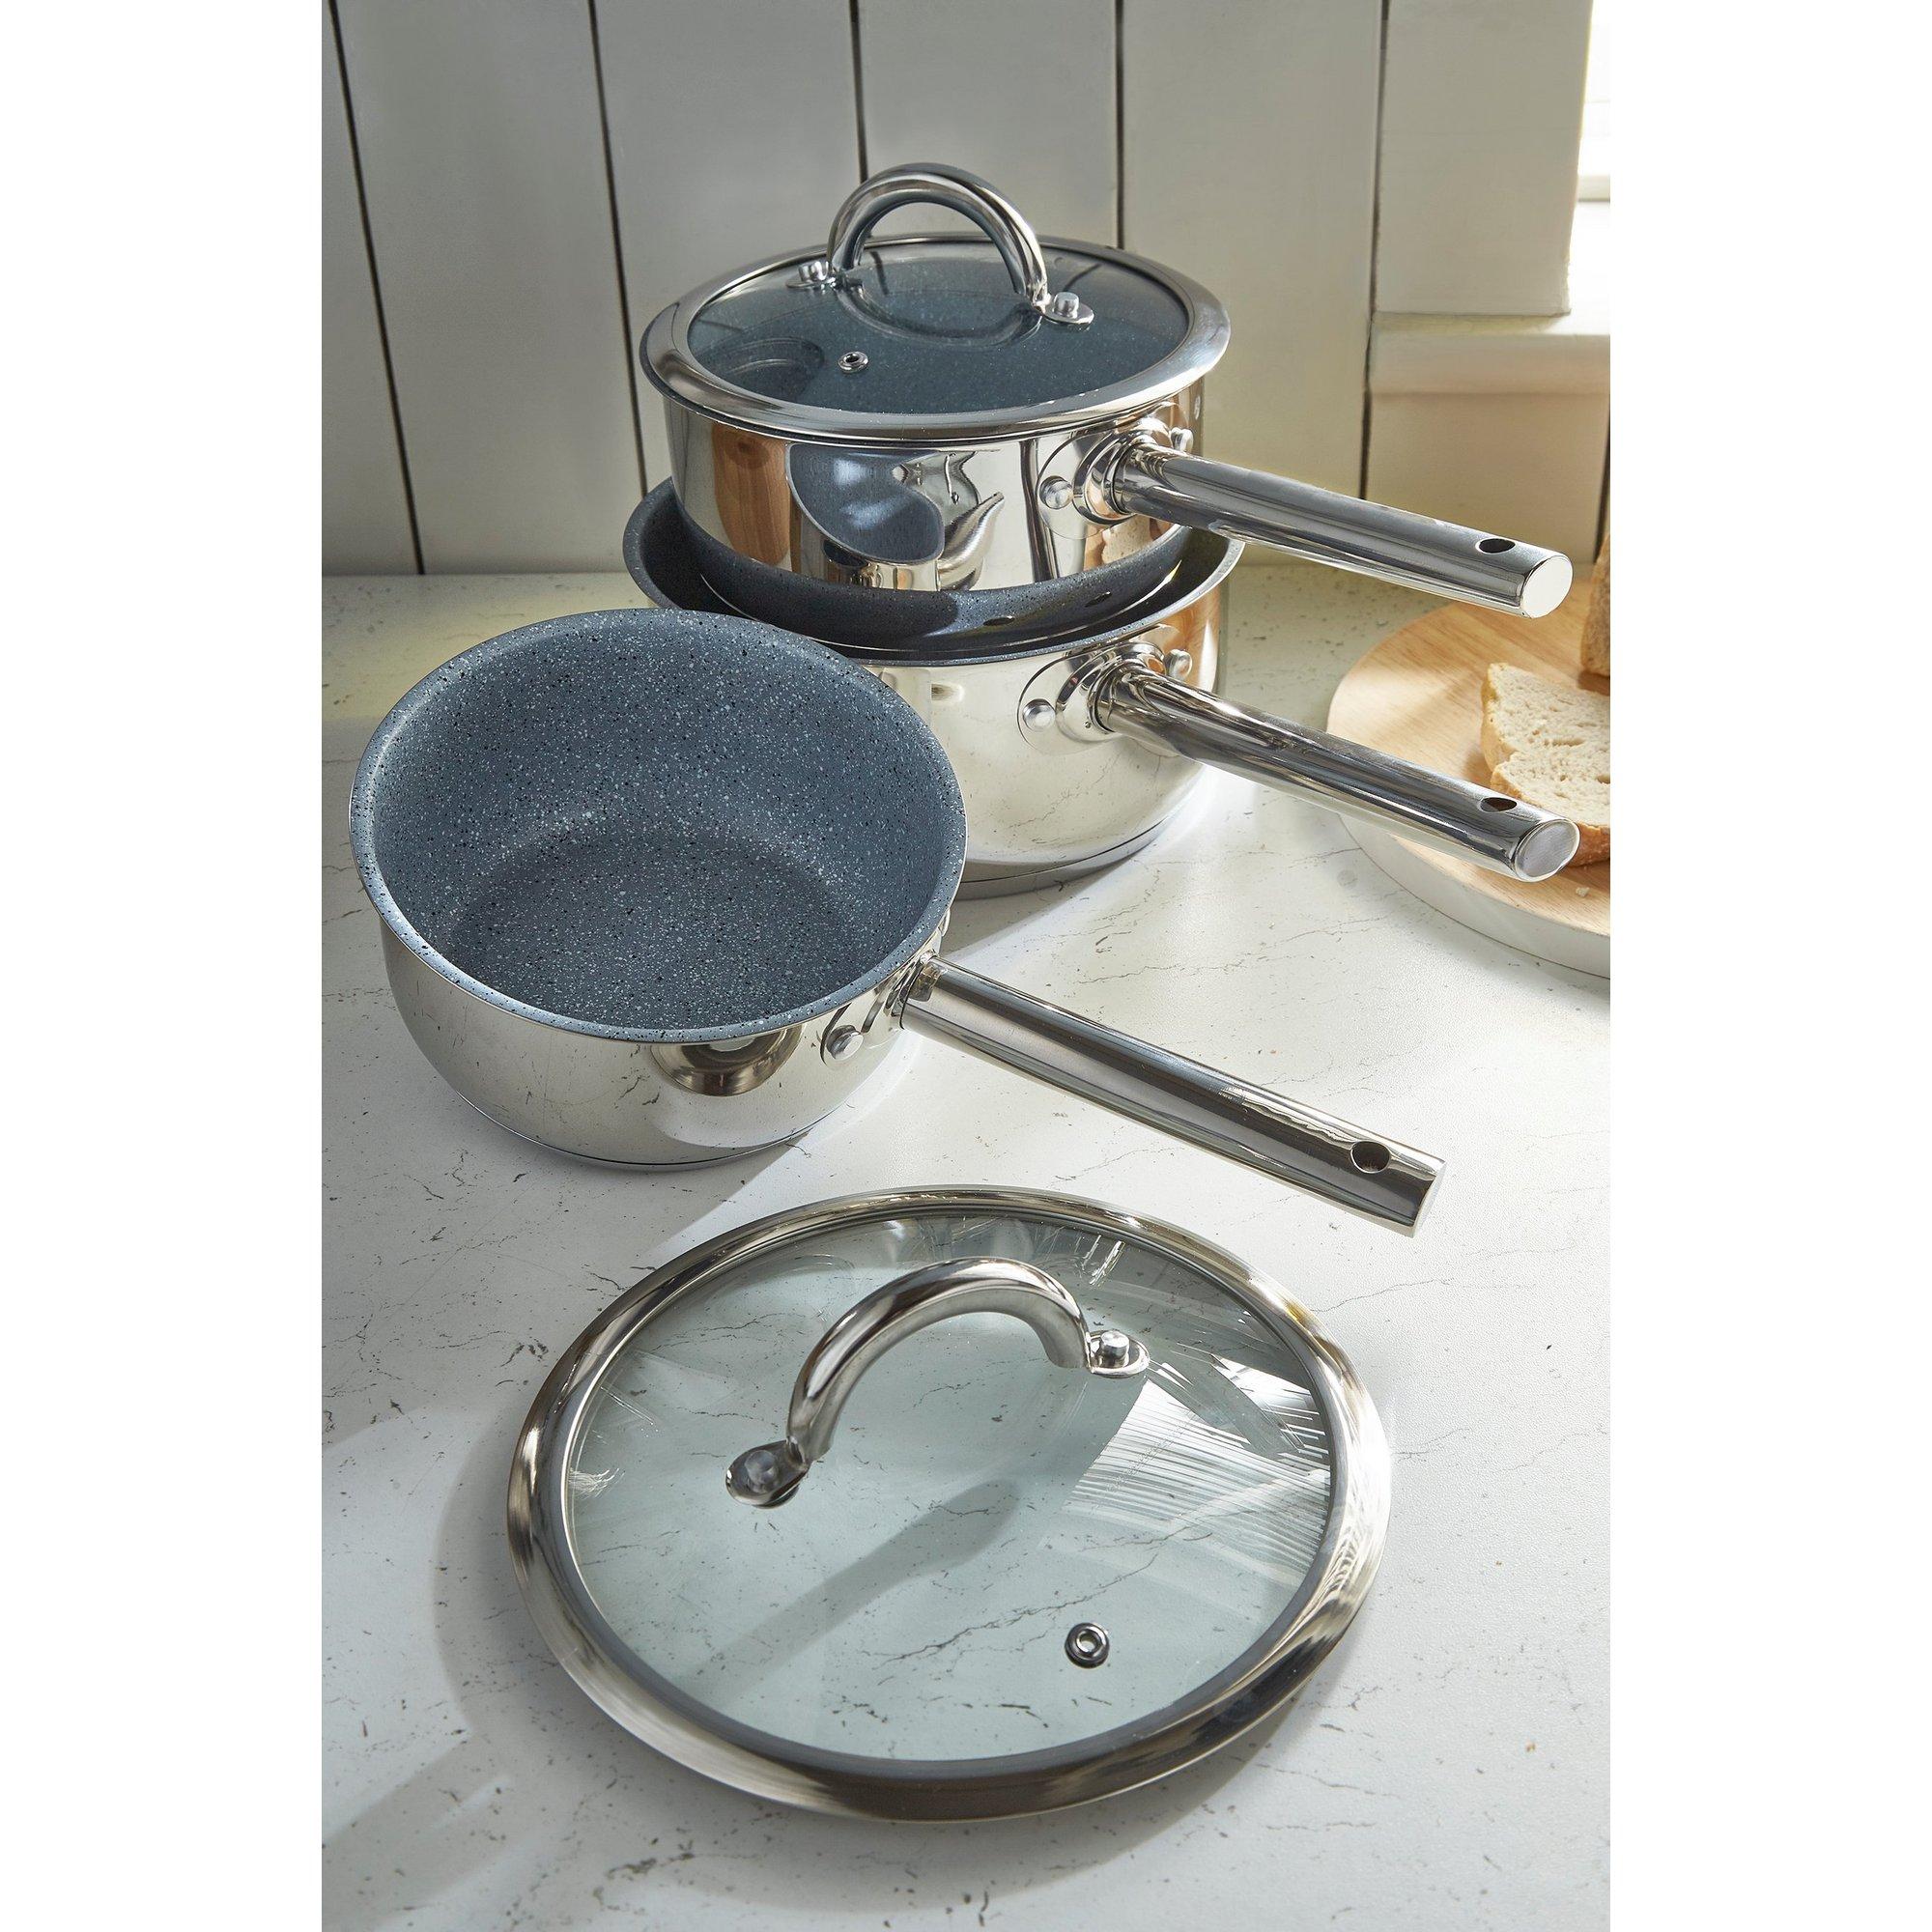 Image of Durastone 3-Piece Non-Stick Stainless Steel Saucepan Set